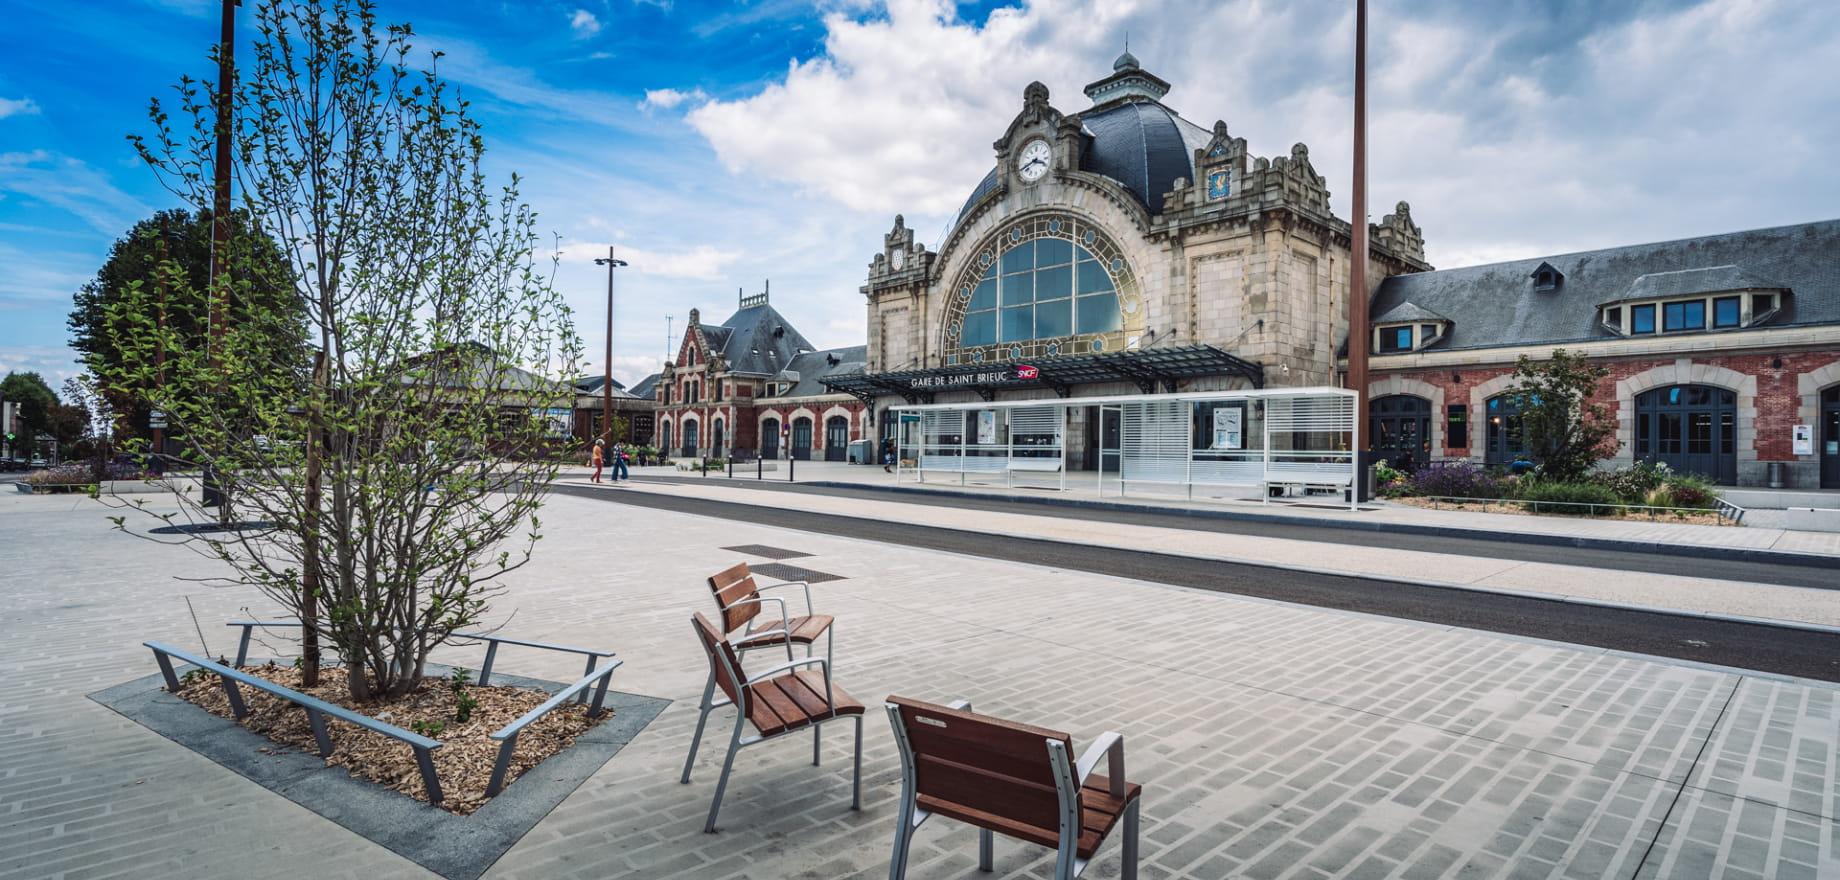 Gare Saint-Brieuc